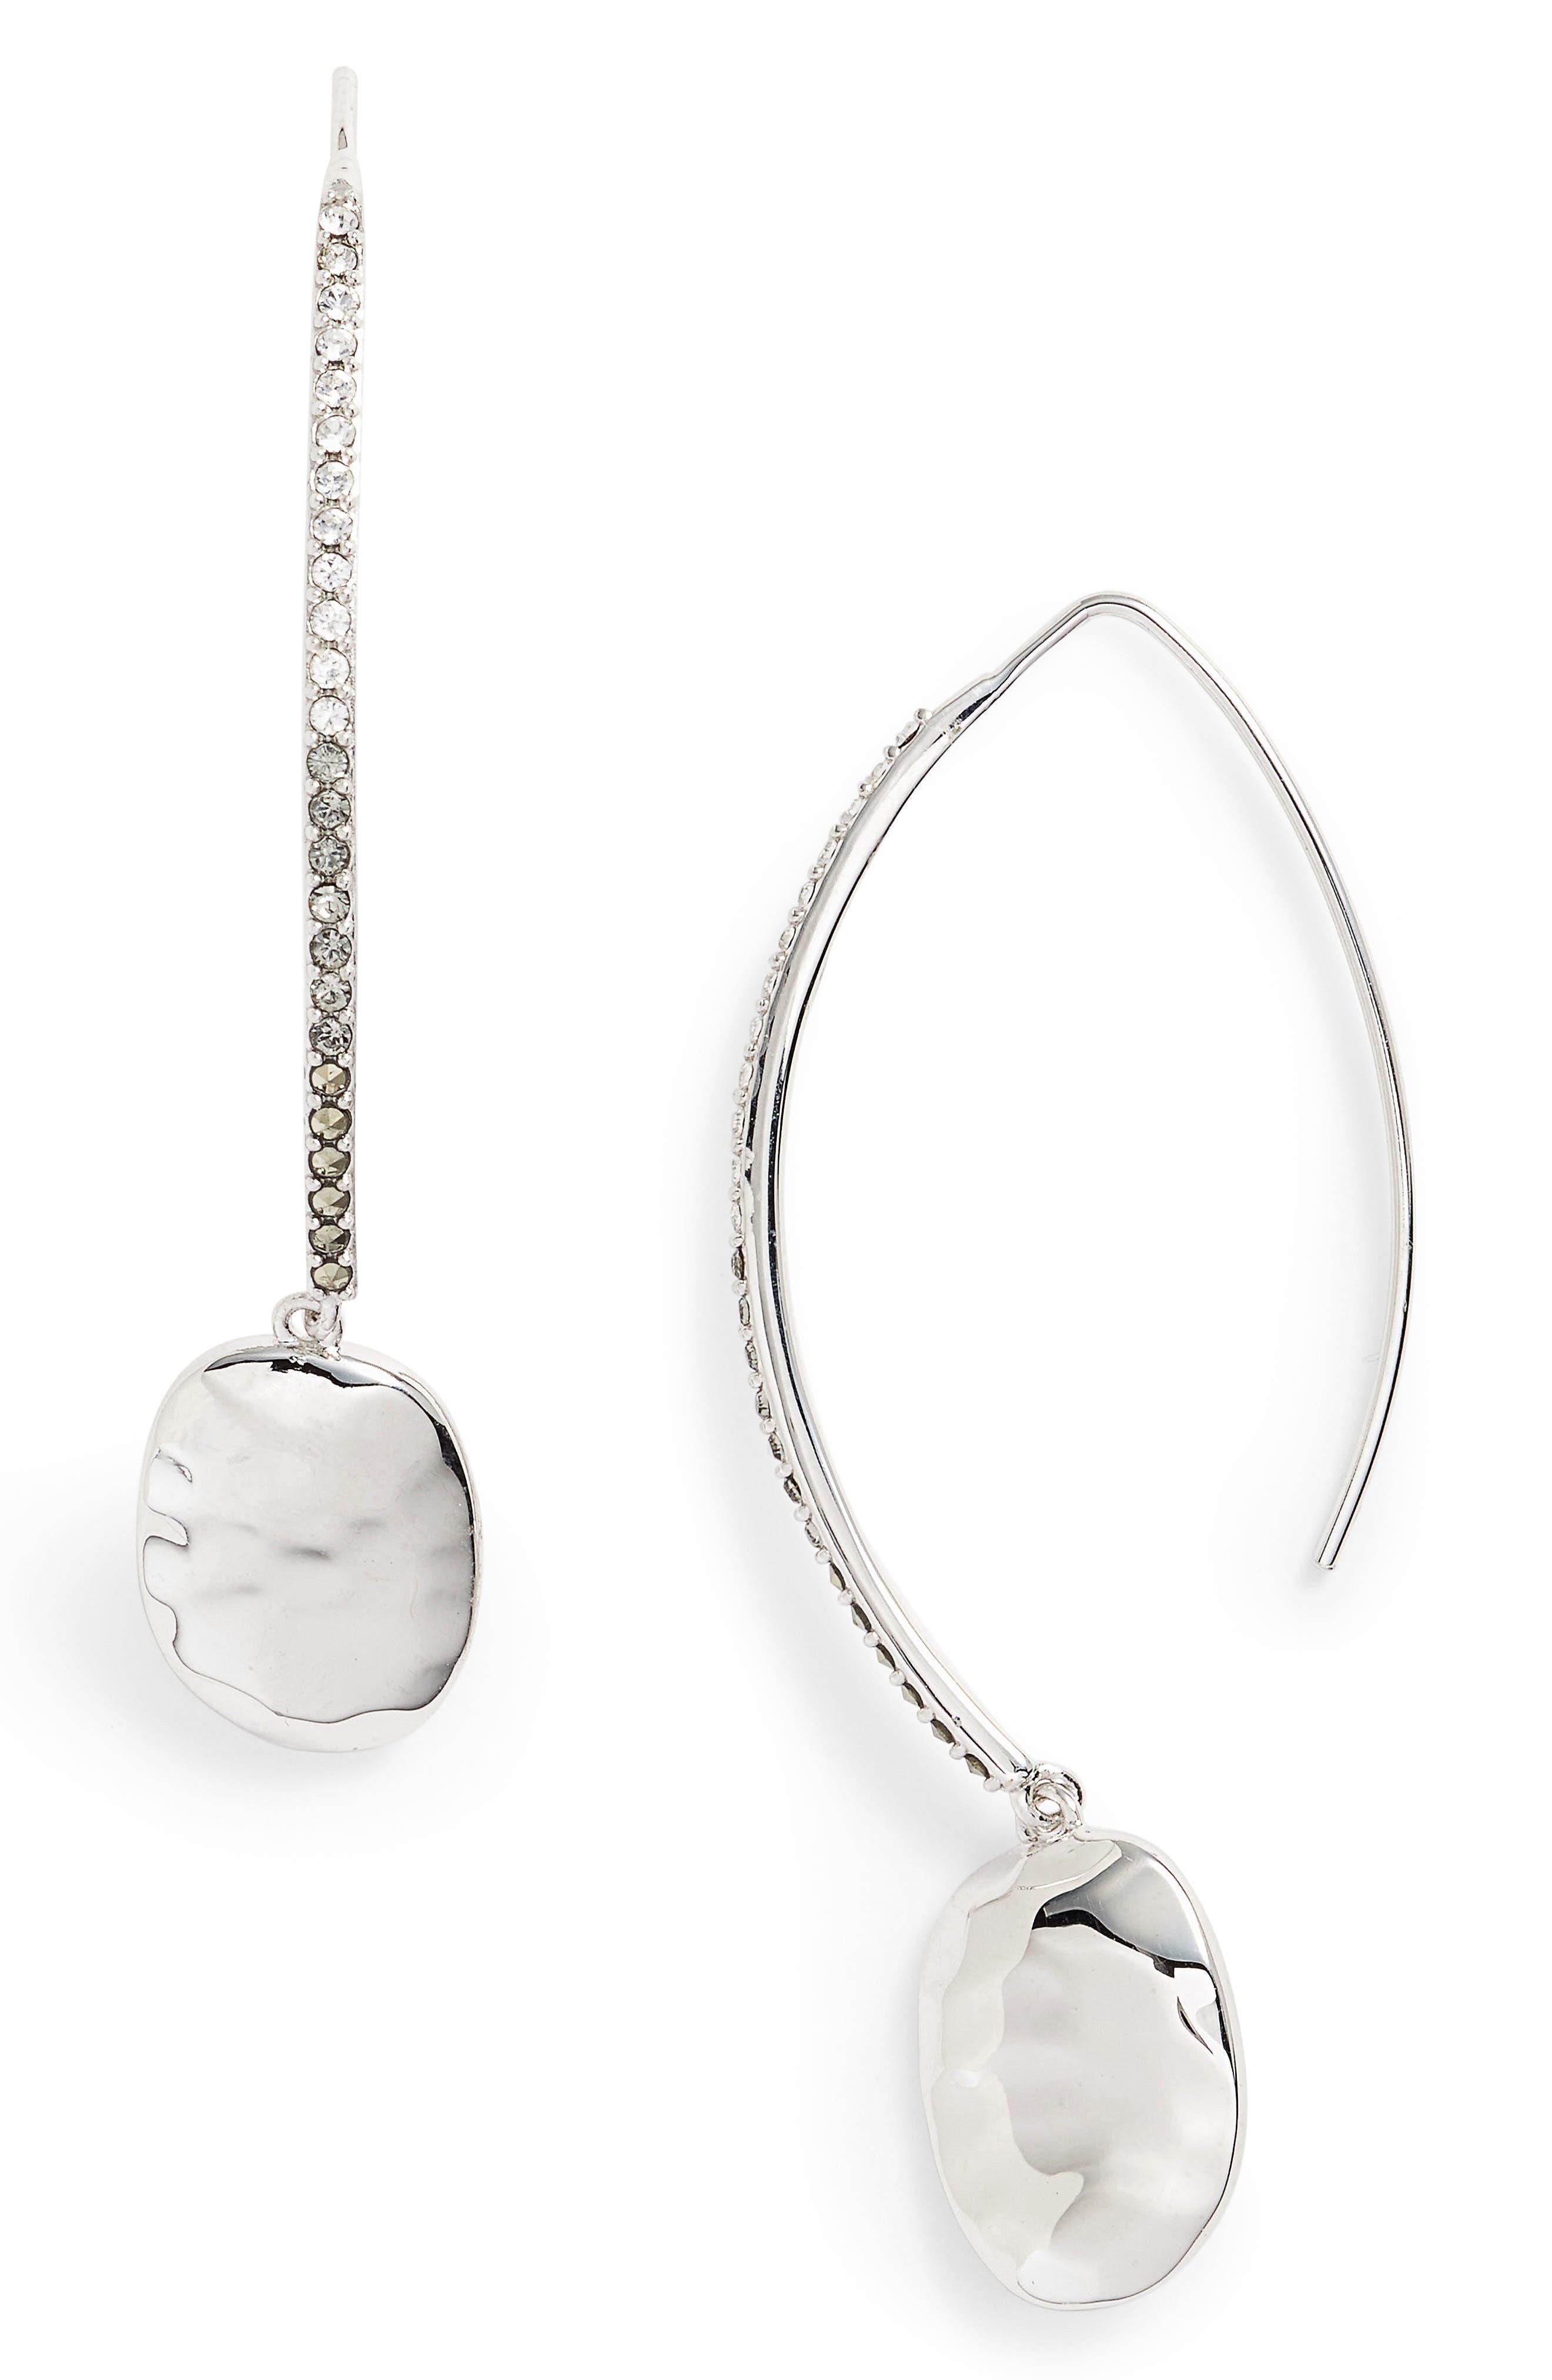 Threader Drop Earrings,                         Main,                         color, Silver